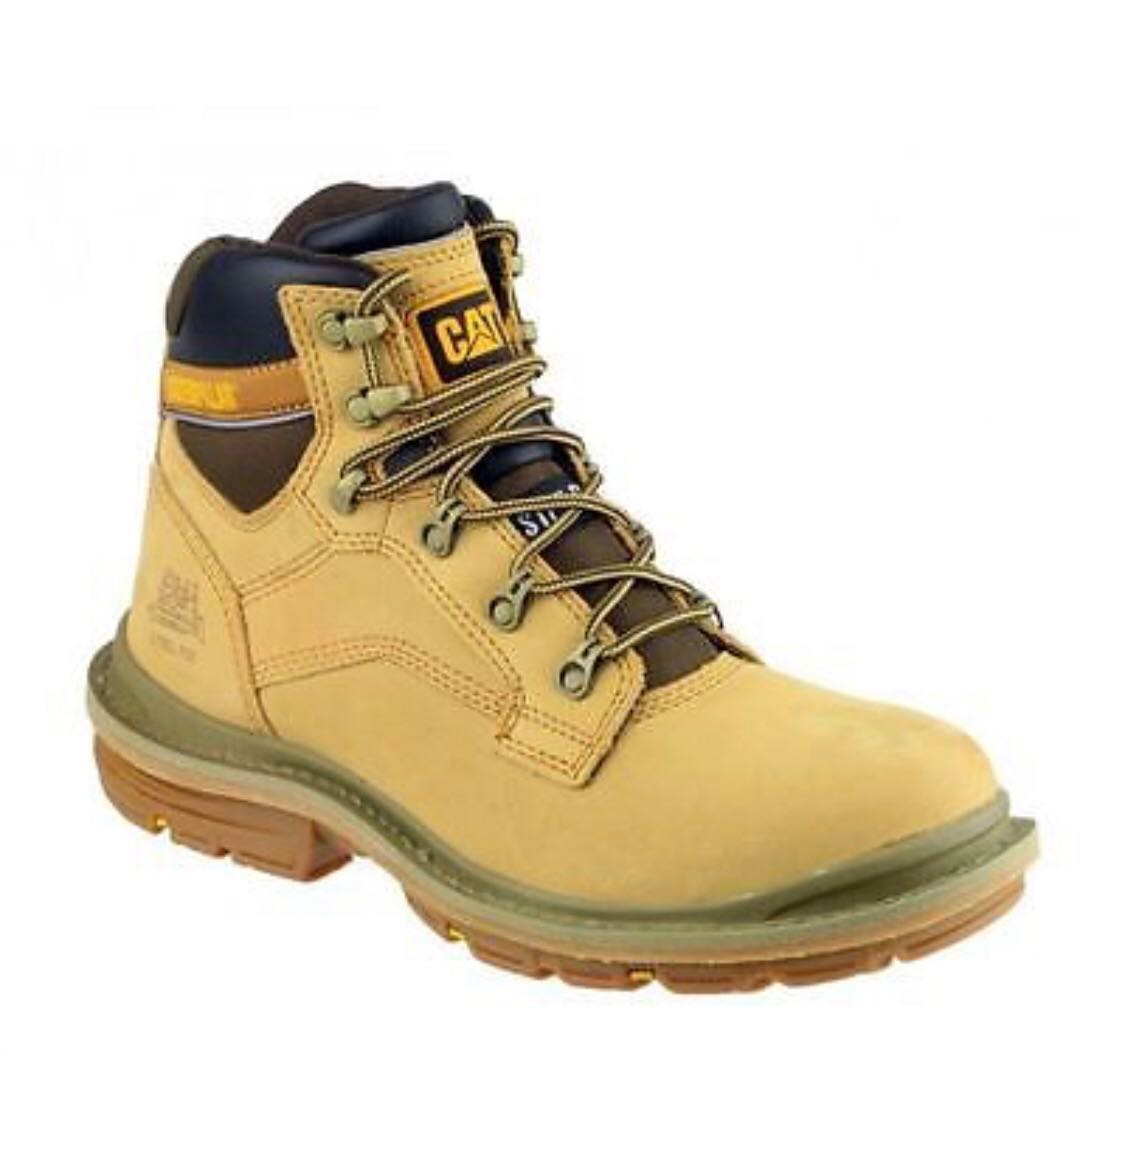 25593b045f4 Caterpillar Boot Generator 8, Men's Fashion, Footwear, Boots on ...